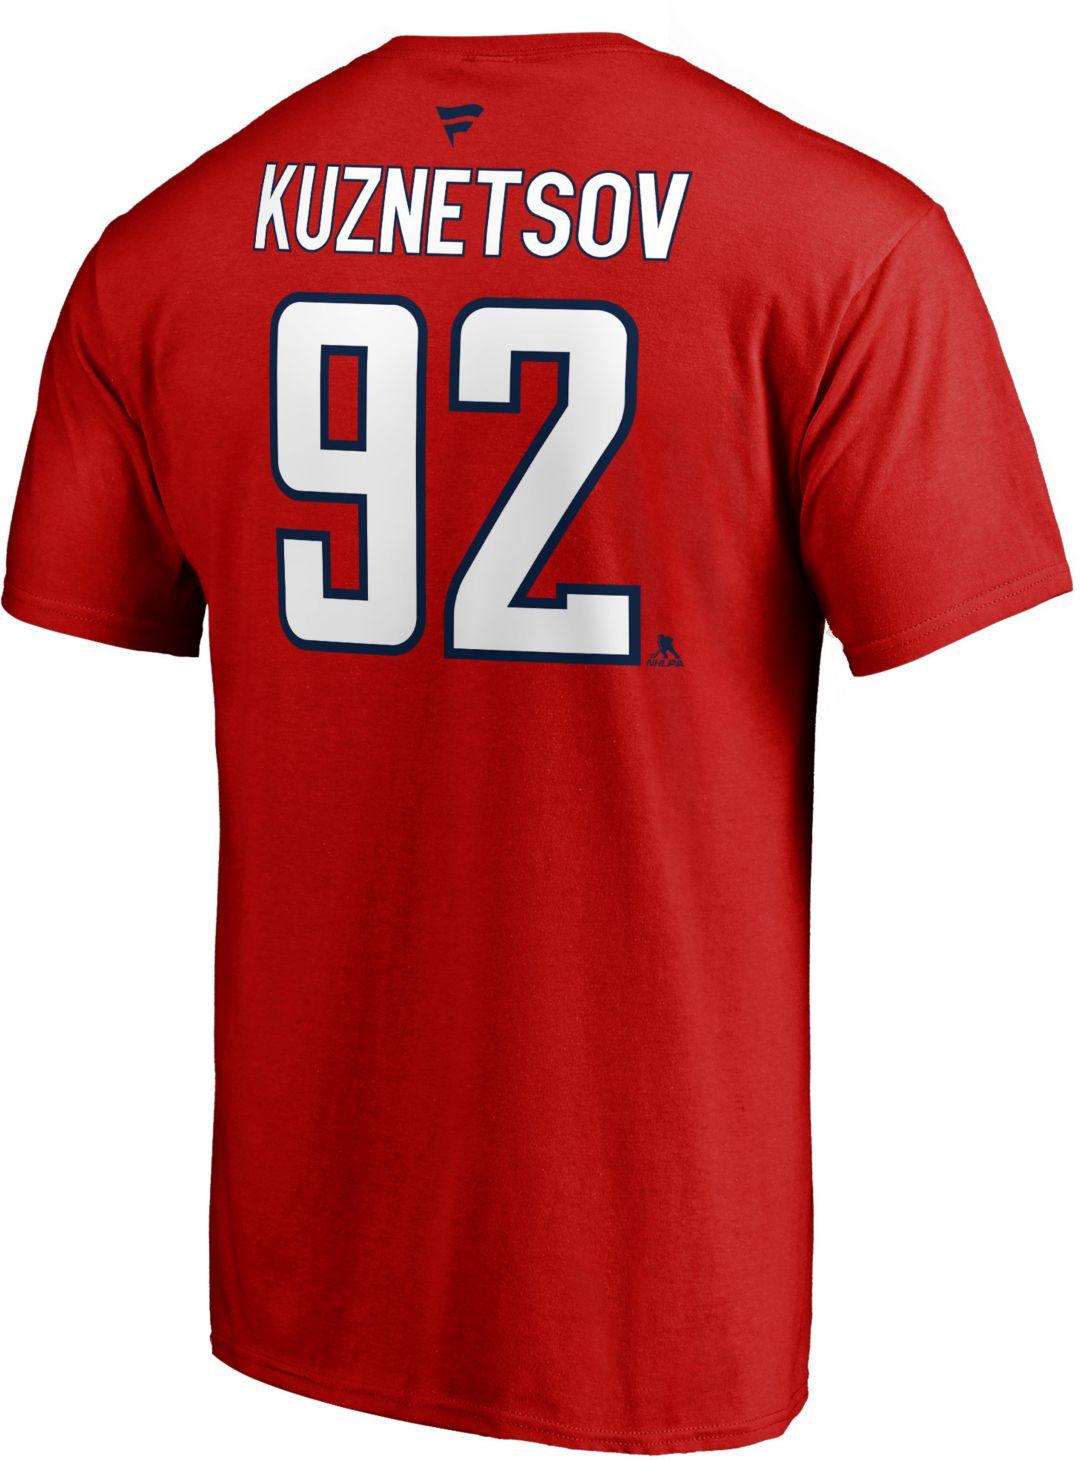 sneakers for cheap 686b8 60ff0 NHL Men's Washington Capitals Evgeny Kuznetsov #92 Red Player T-Shirt